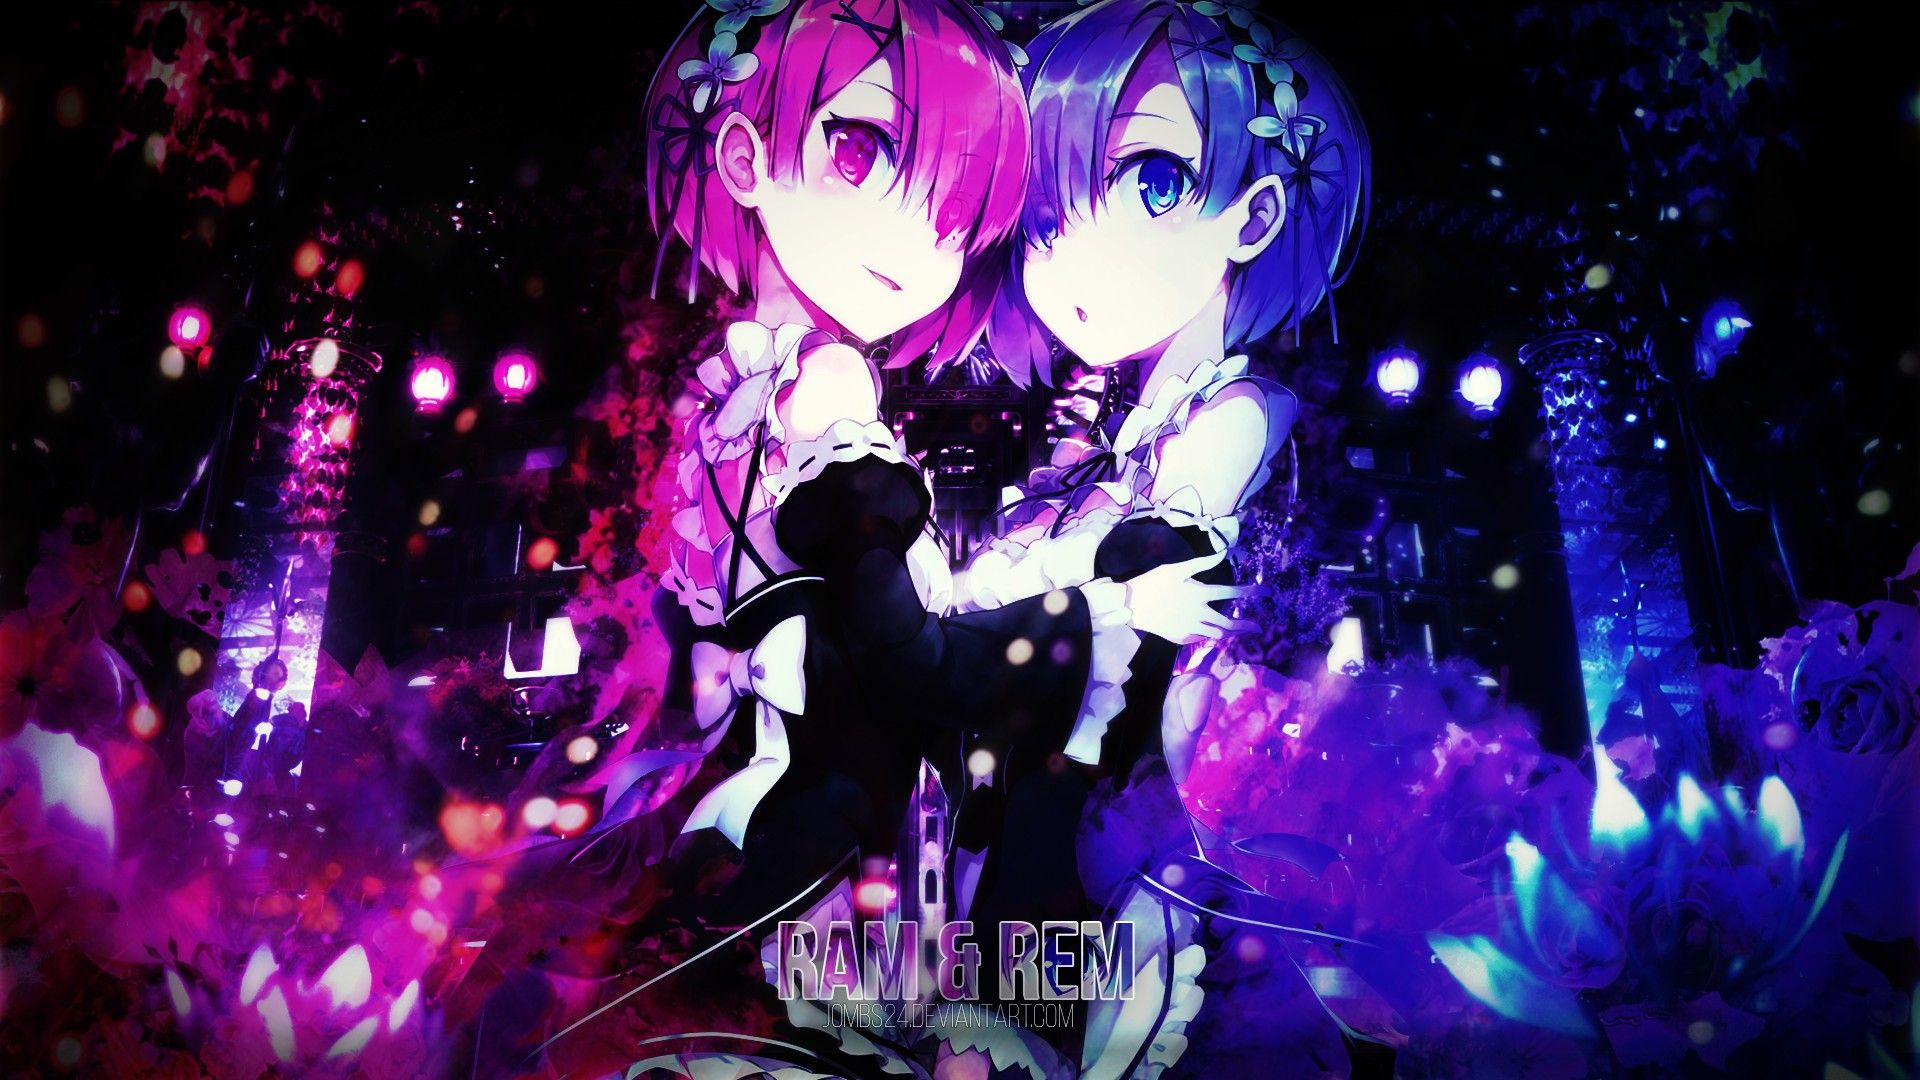 Re Zero Wallpaper Rem And Ram 2021 Live Wallpaper Hd Re Zero Wallpaper Anime Anime Wallpaper